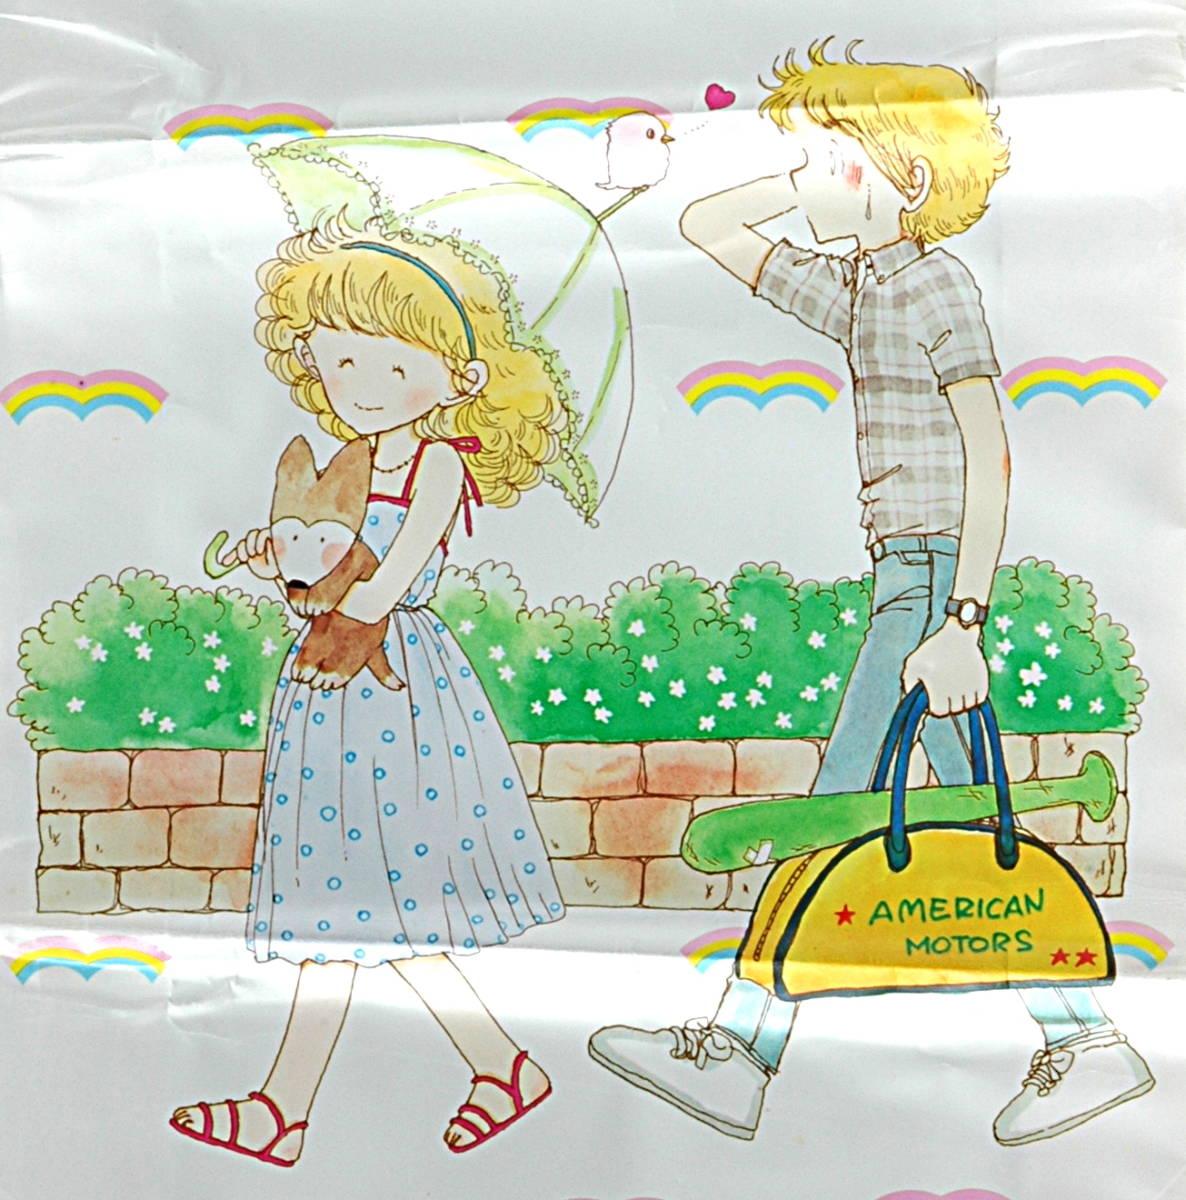 [Vintage] [New Item] [Delivery Free]1980s Ribbon Issued Mutsu Ako Gazette Bag りぼん付録 陸奥 A子 ガゼット袋(ビニール小物入れ)_画像3